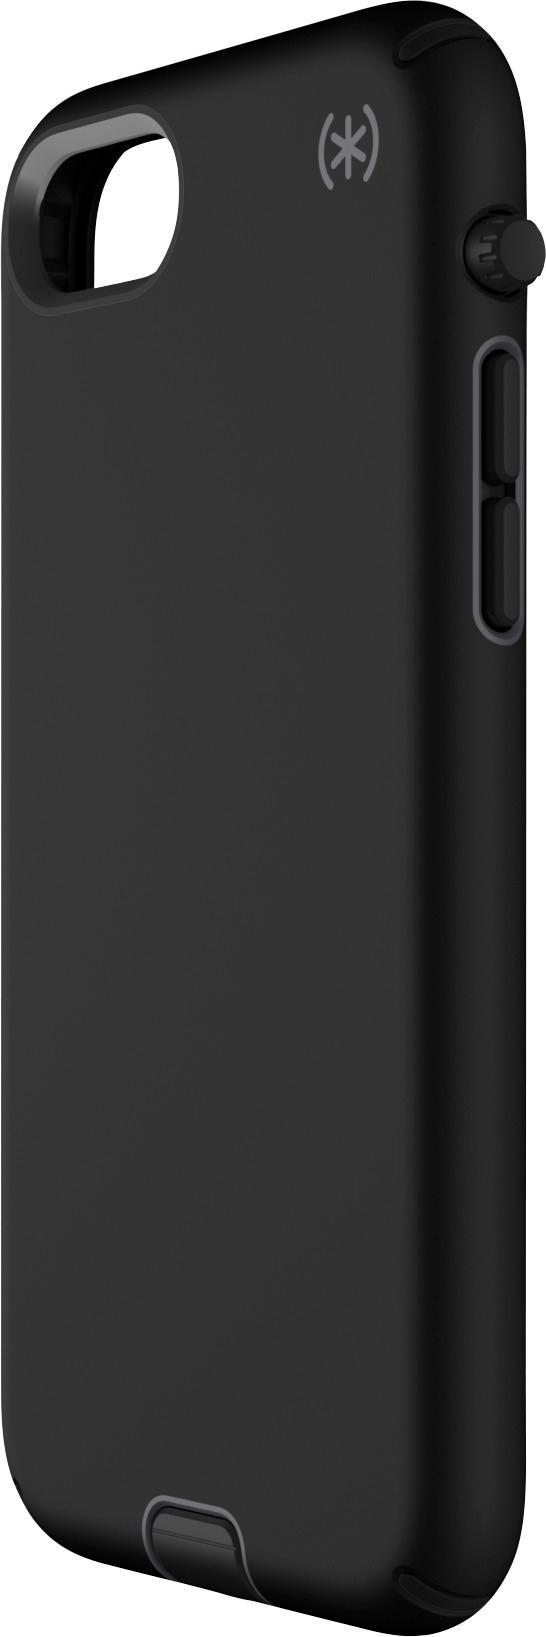 Speck Presidio Sport iPhone X Black Gunmetal Grey Black 104441-6683